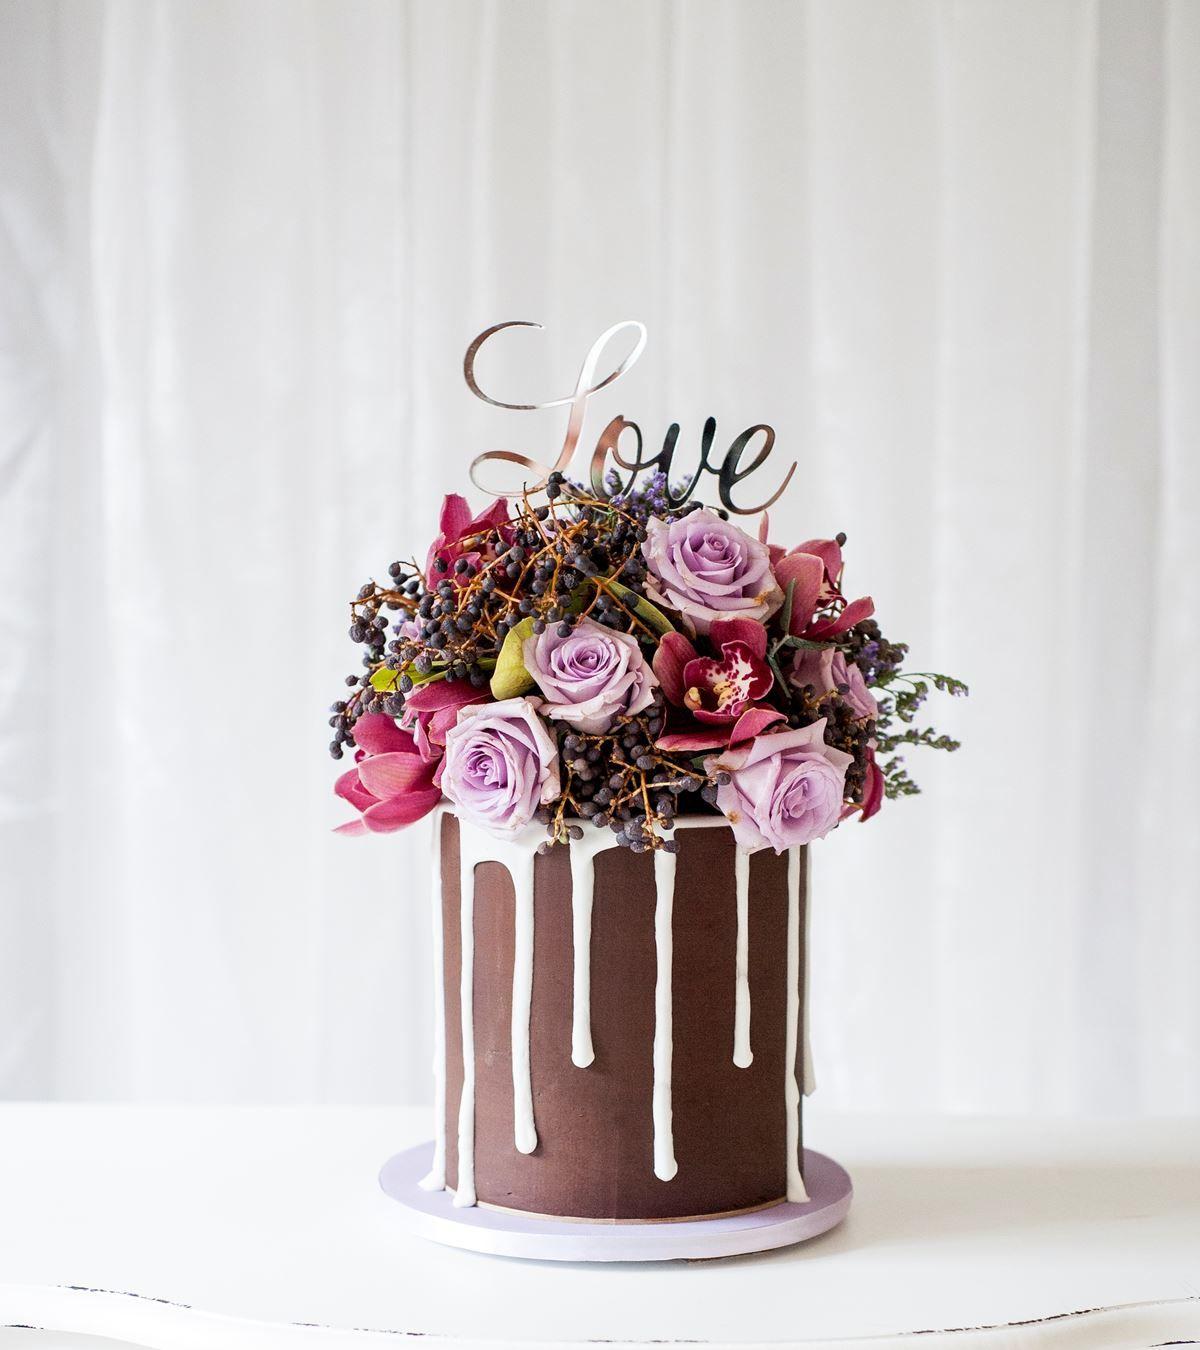 Sweet affection cake designs wedding cakes coburg easy weddings